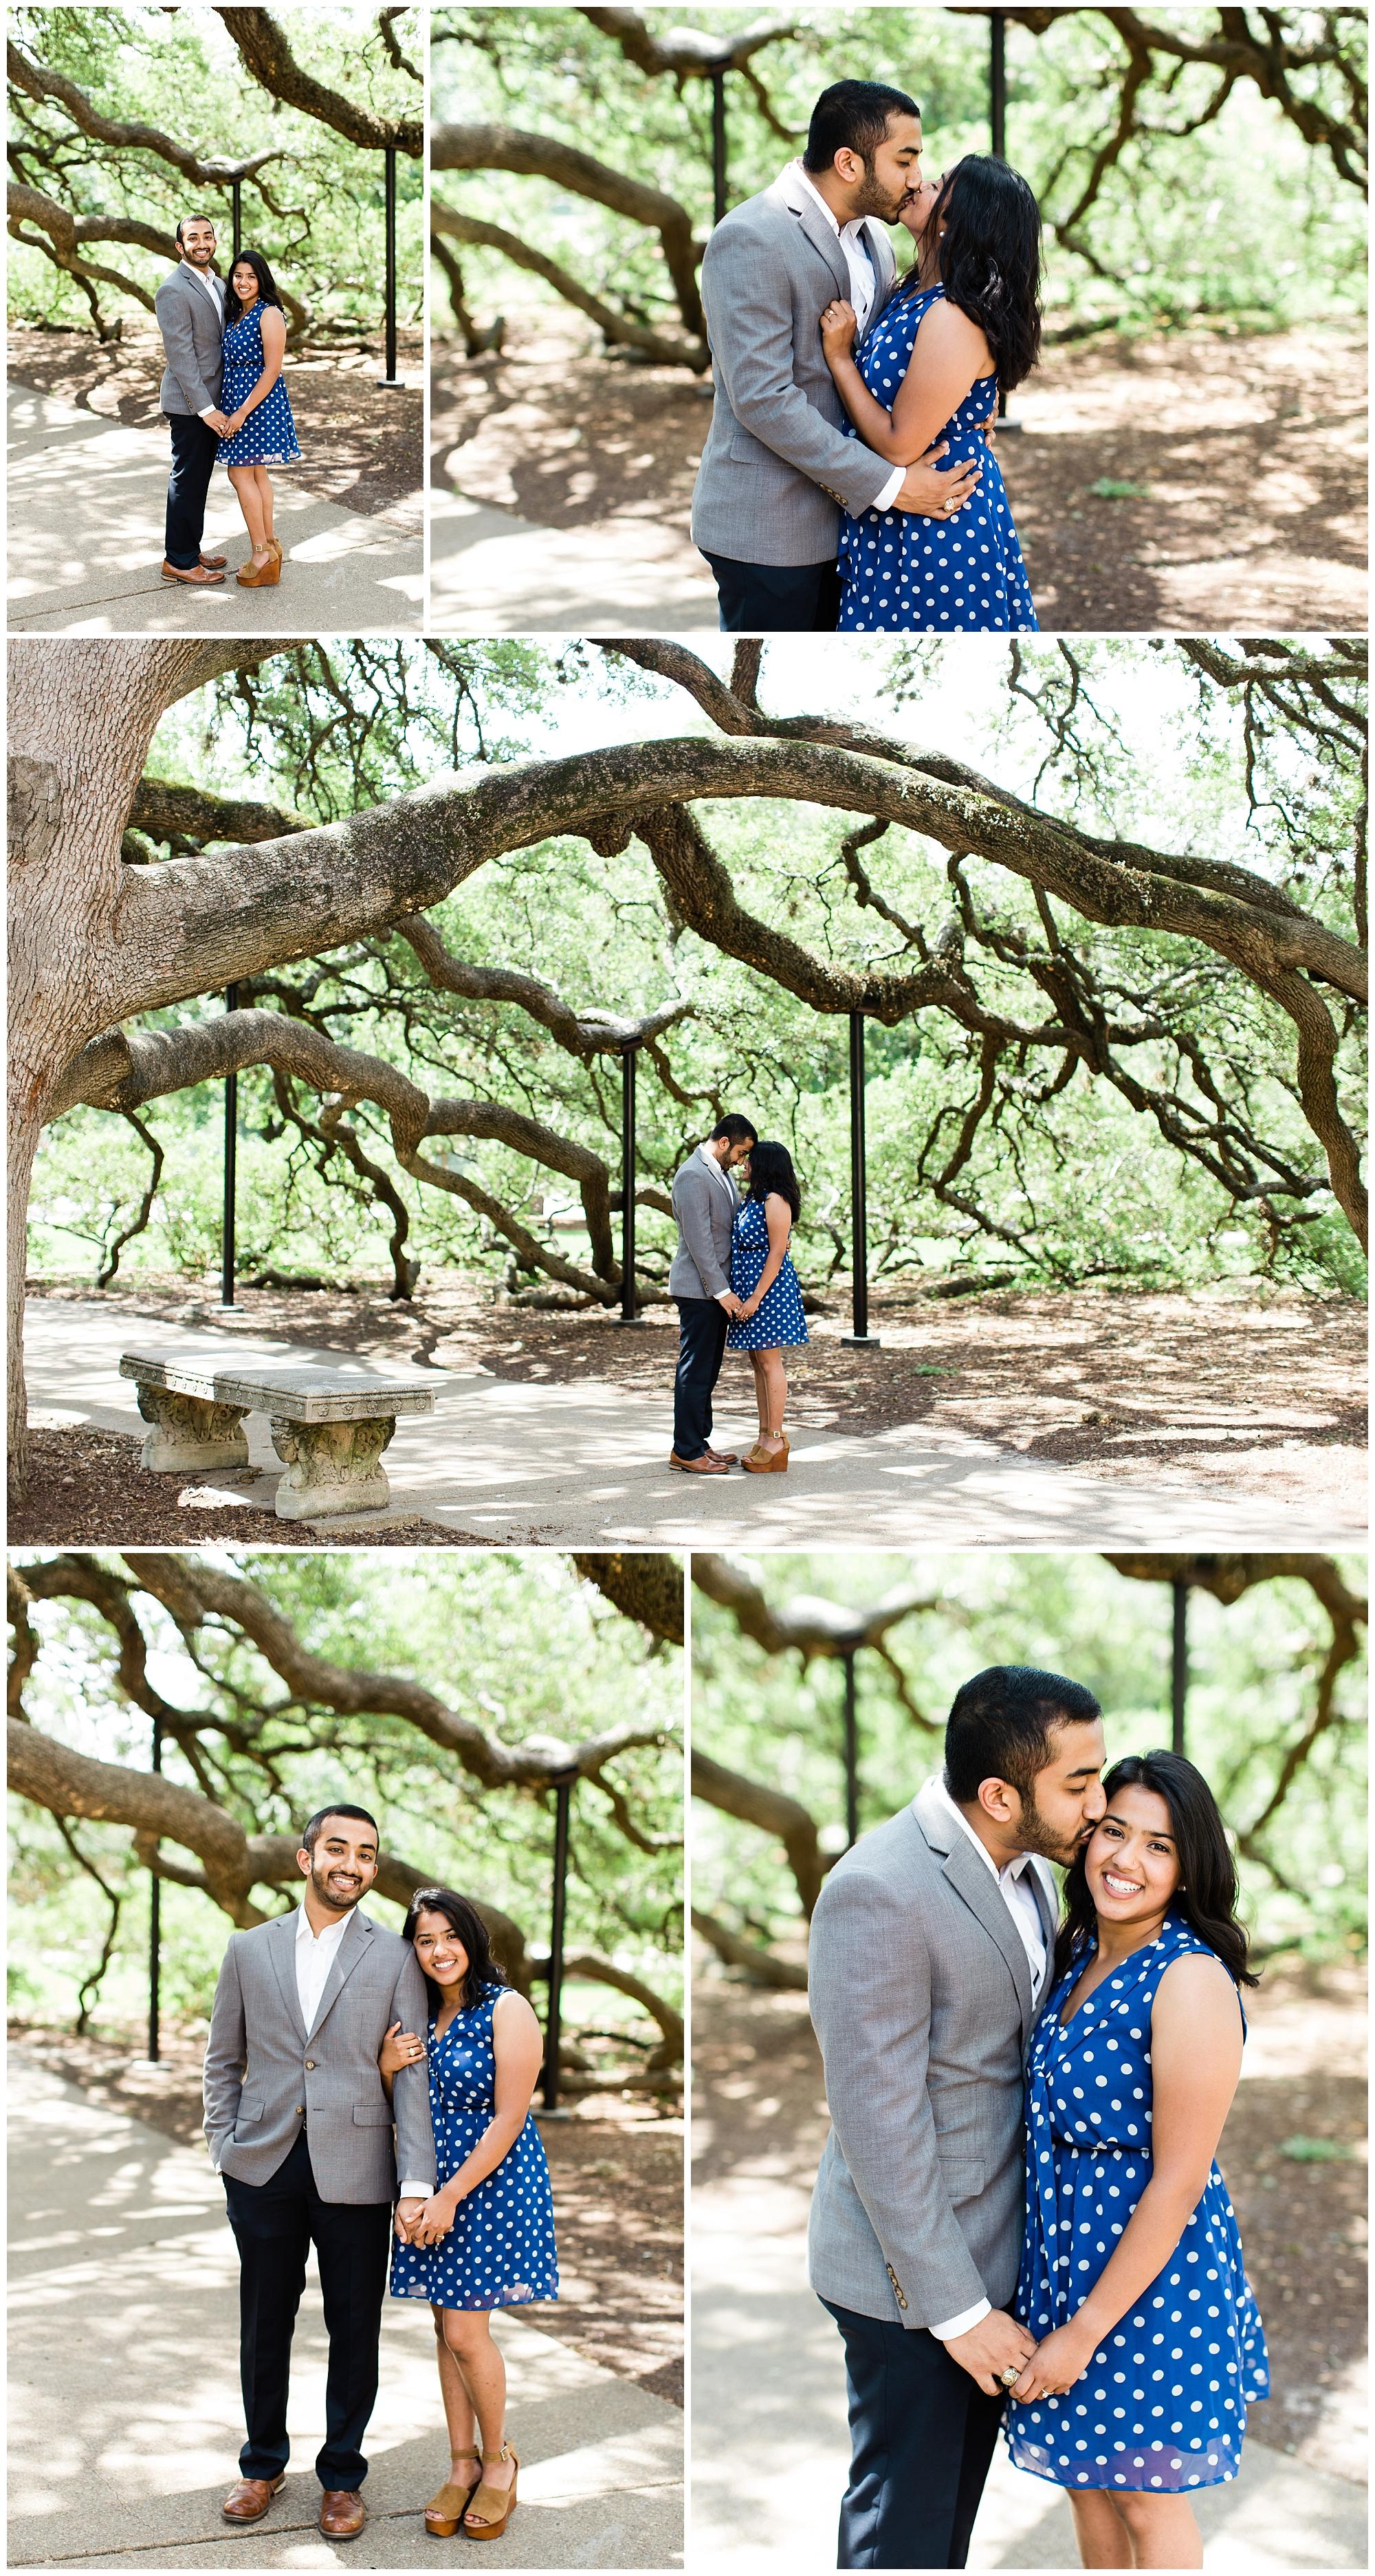 Century_Tree_Proposal_0004.jpg